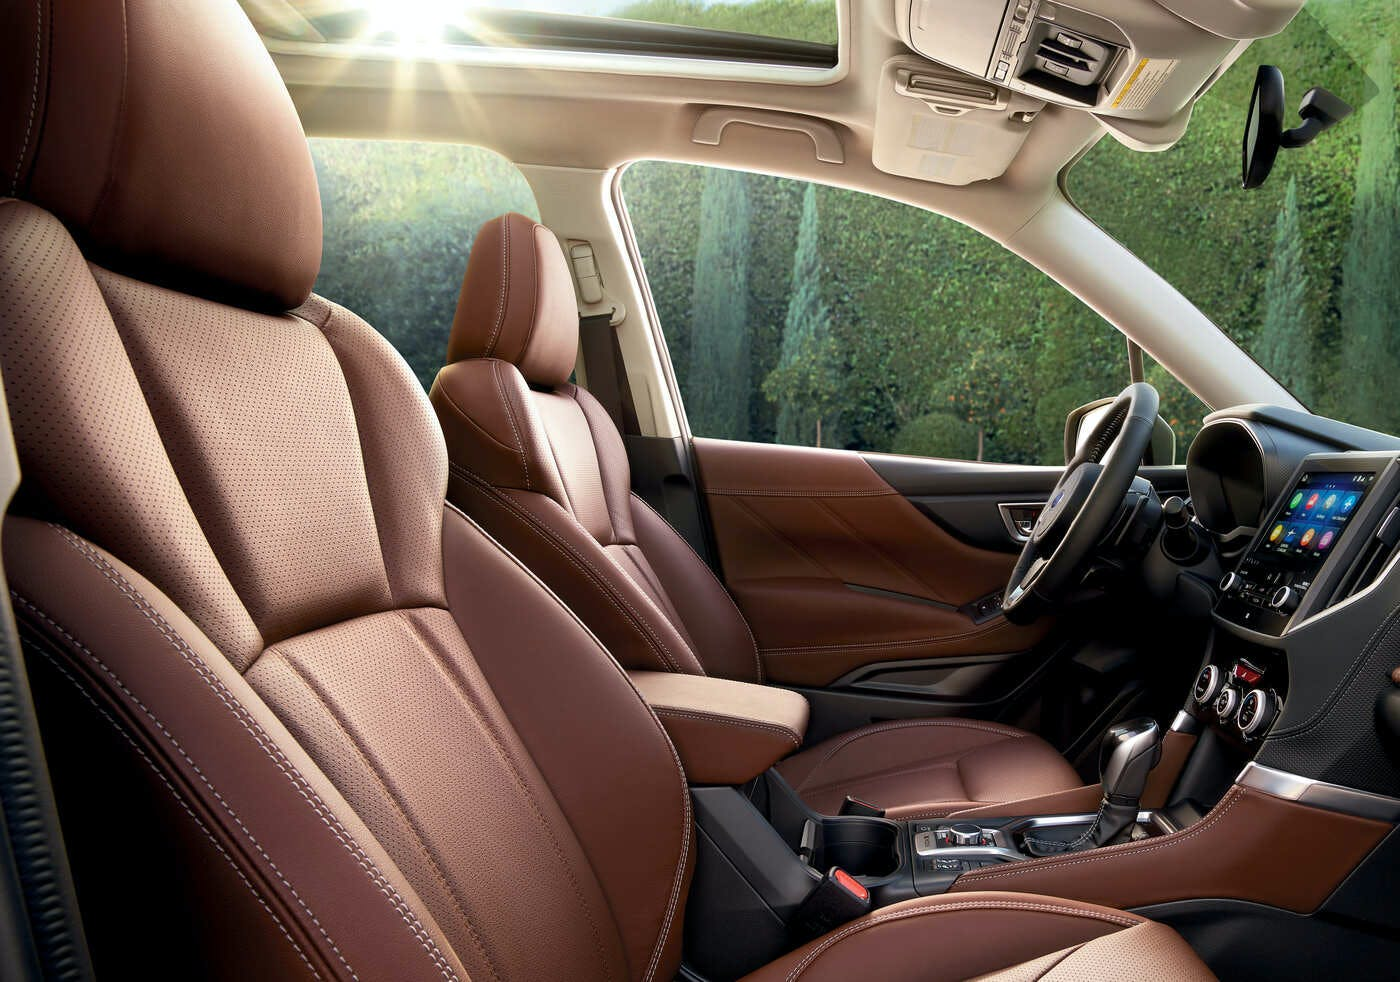 2019 Subaru Forester Comparisons, Reviews & Pictures | TrueCar